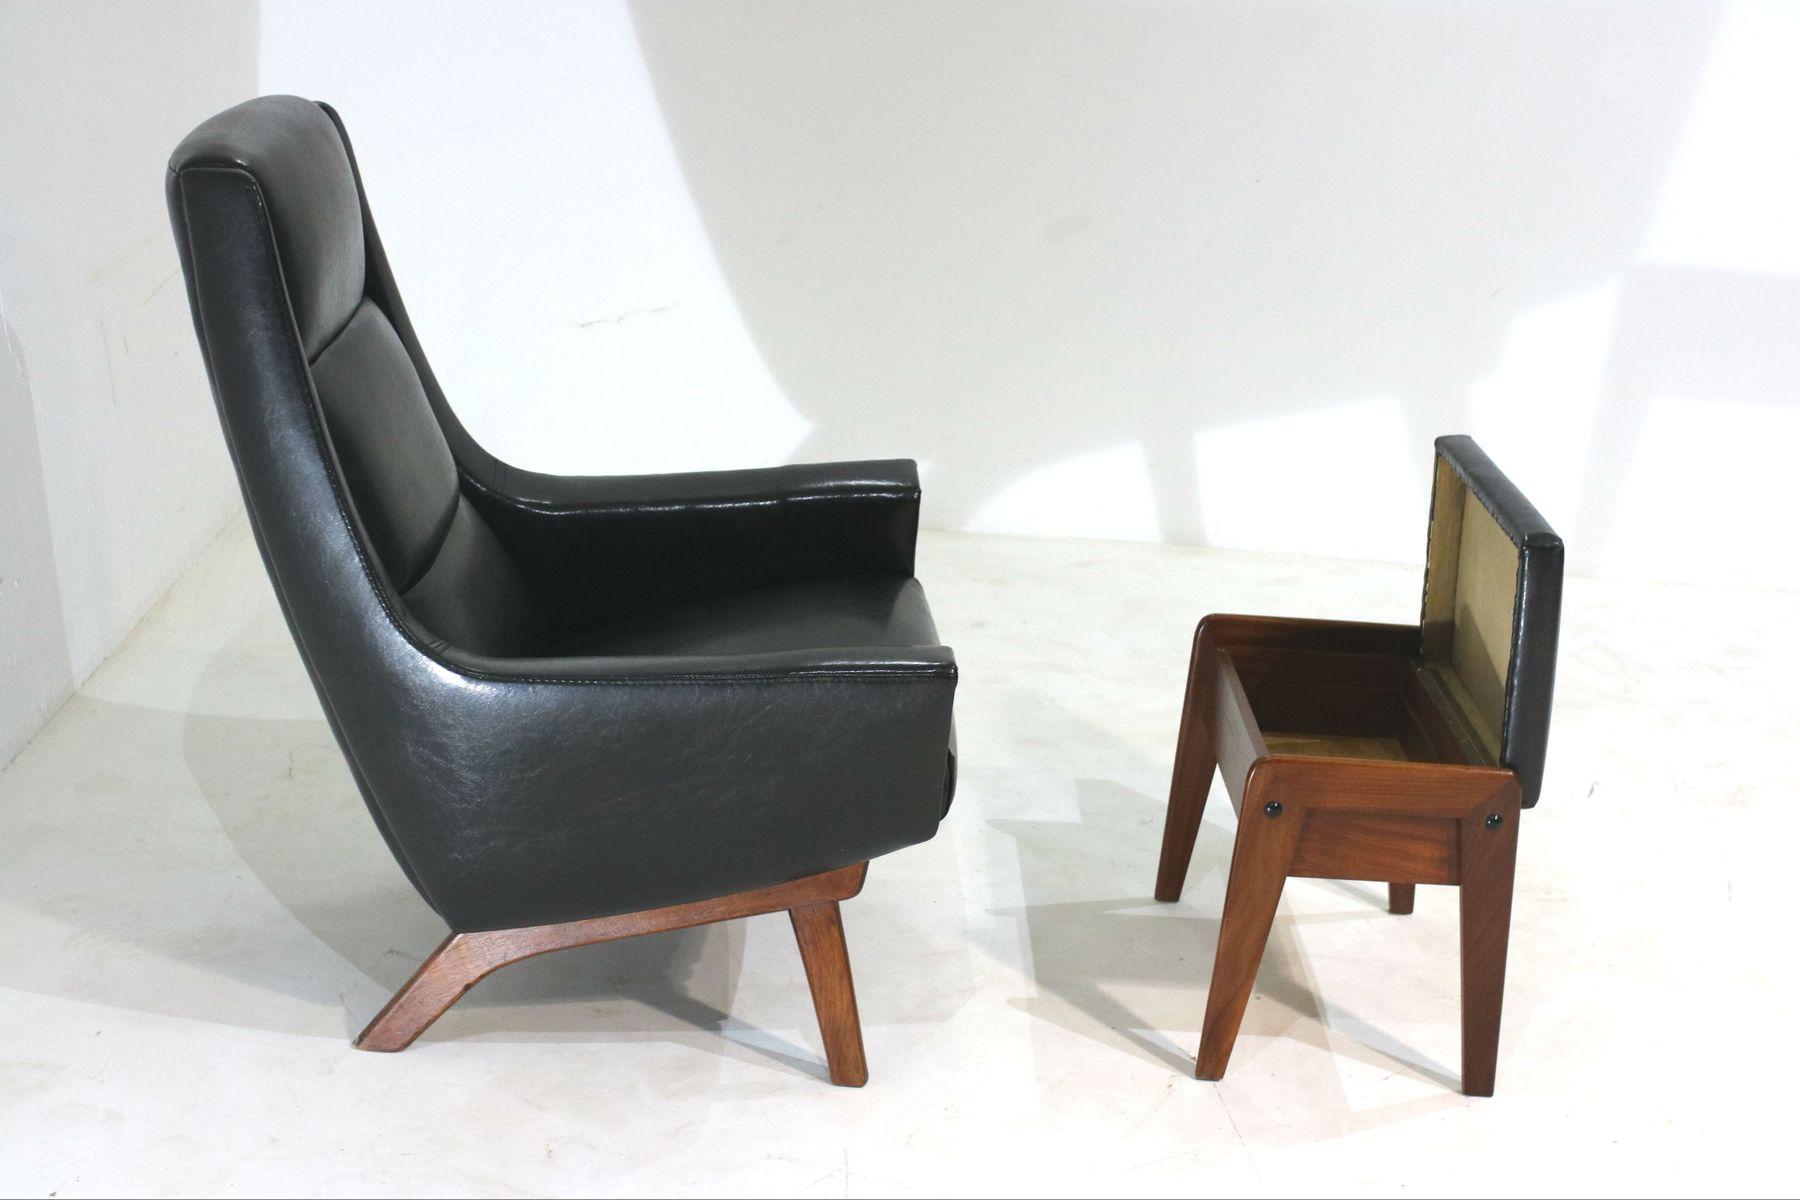 Danischer Sessel Hocker 1960er Bei Pamono Kaufen